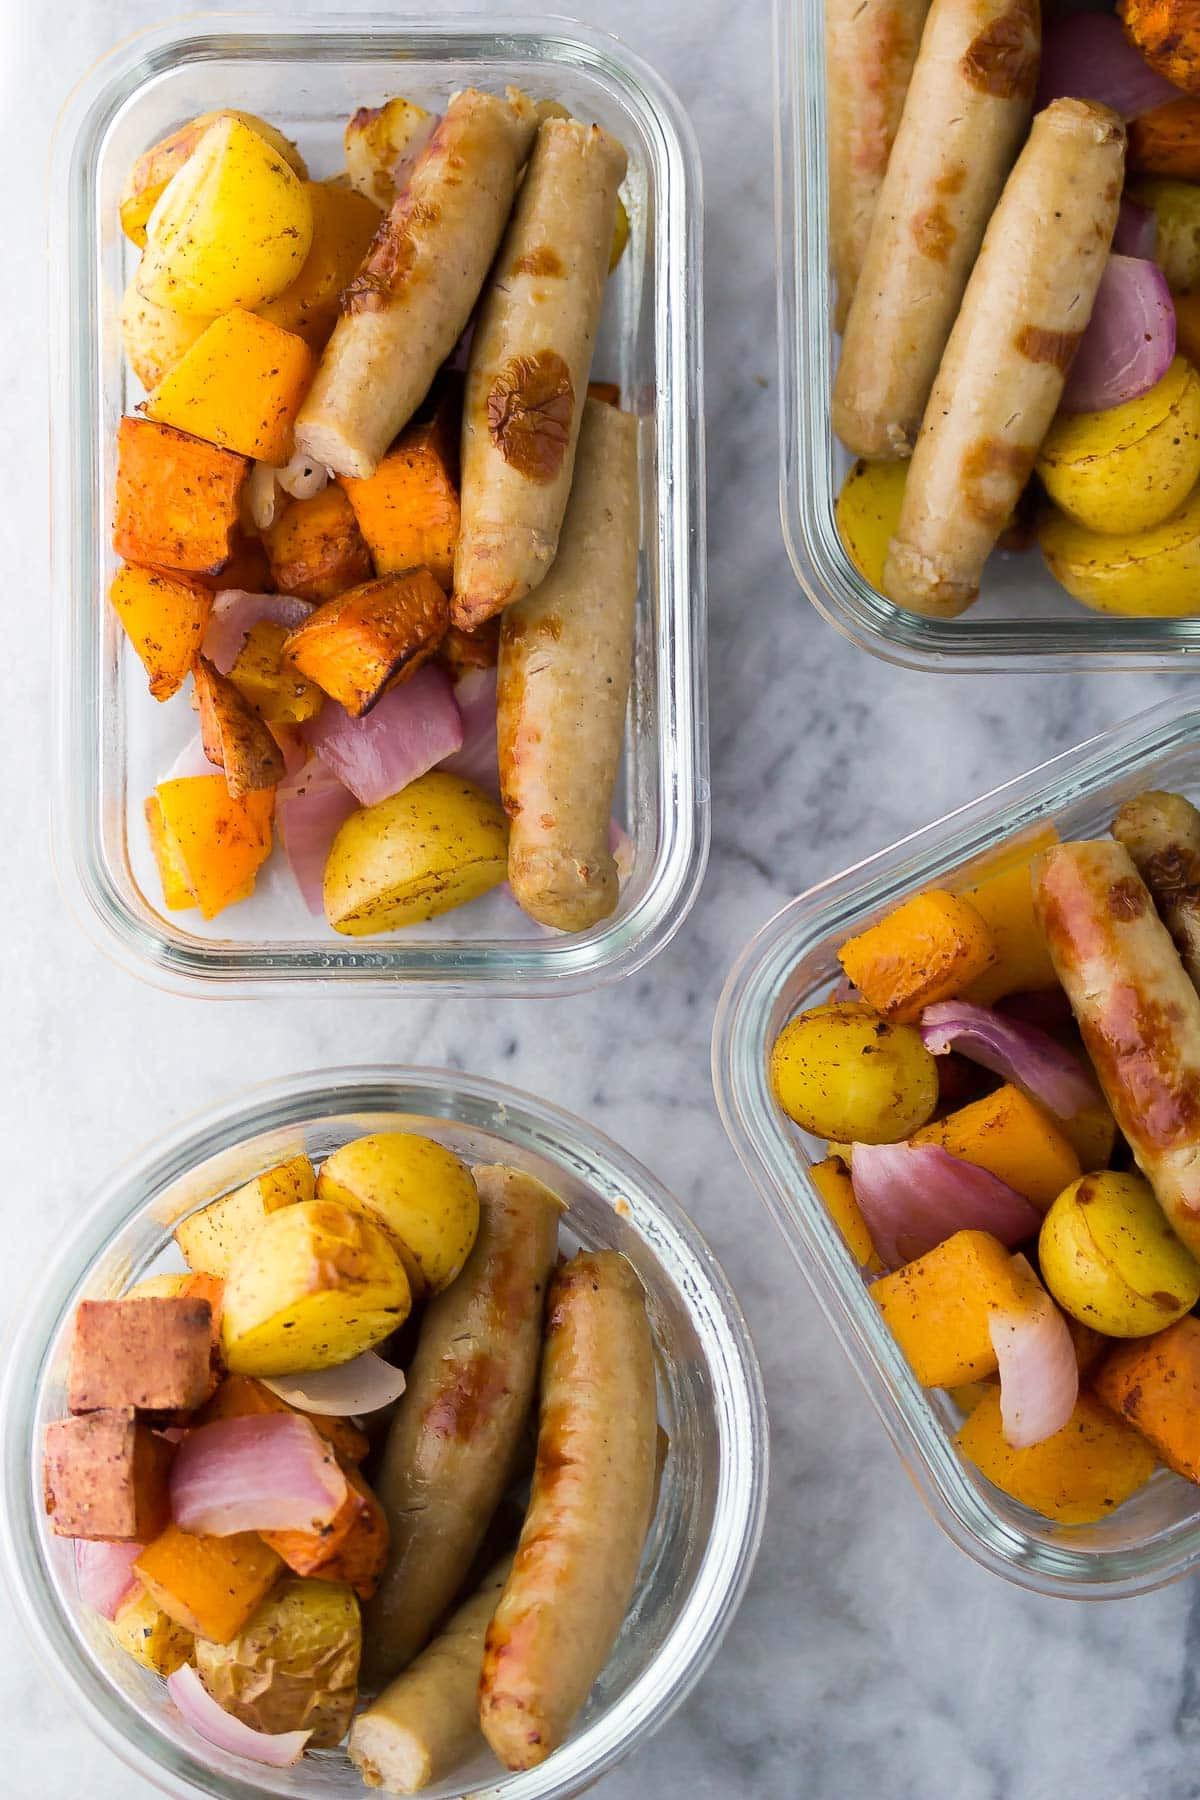 Healthy Breakfast Sausage  Make Ahead Healthy Sausage Breakfast Bowls